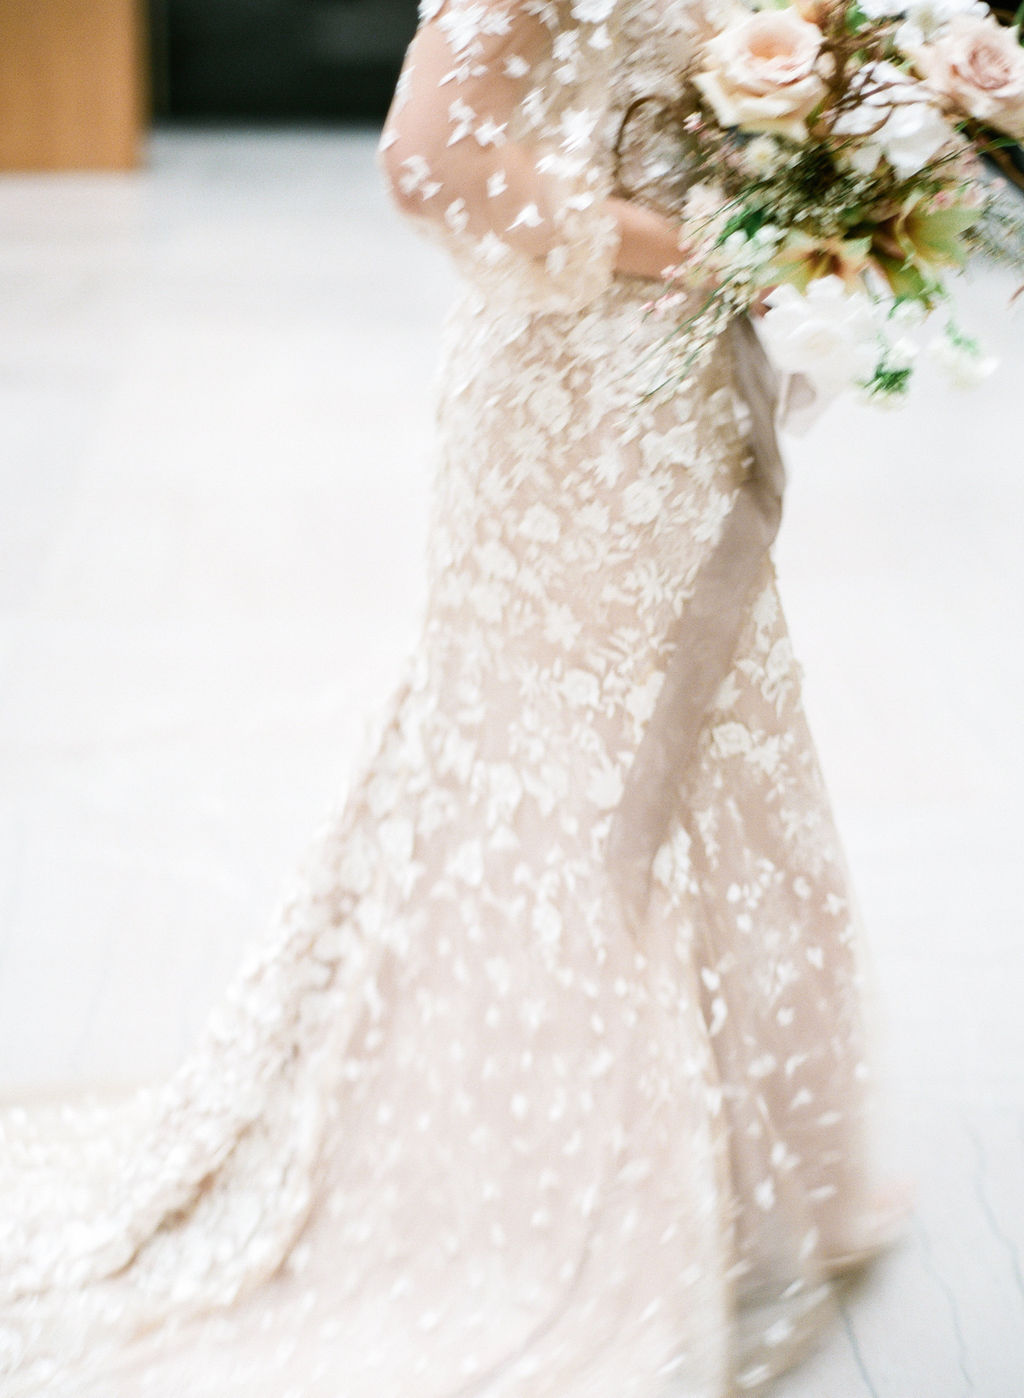 artiese-ago-wedding-editorial-000423620005.jpg